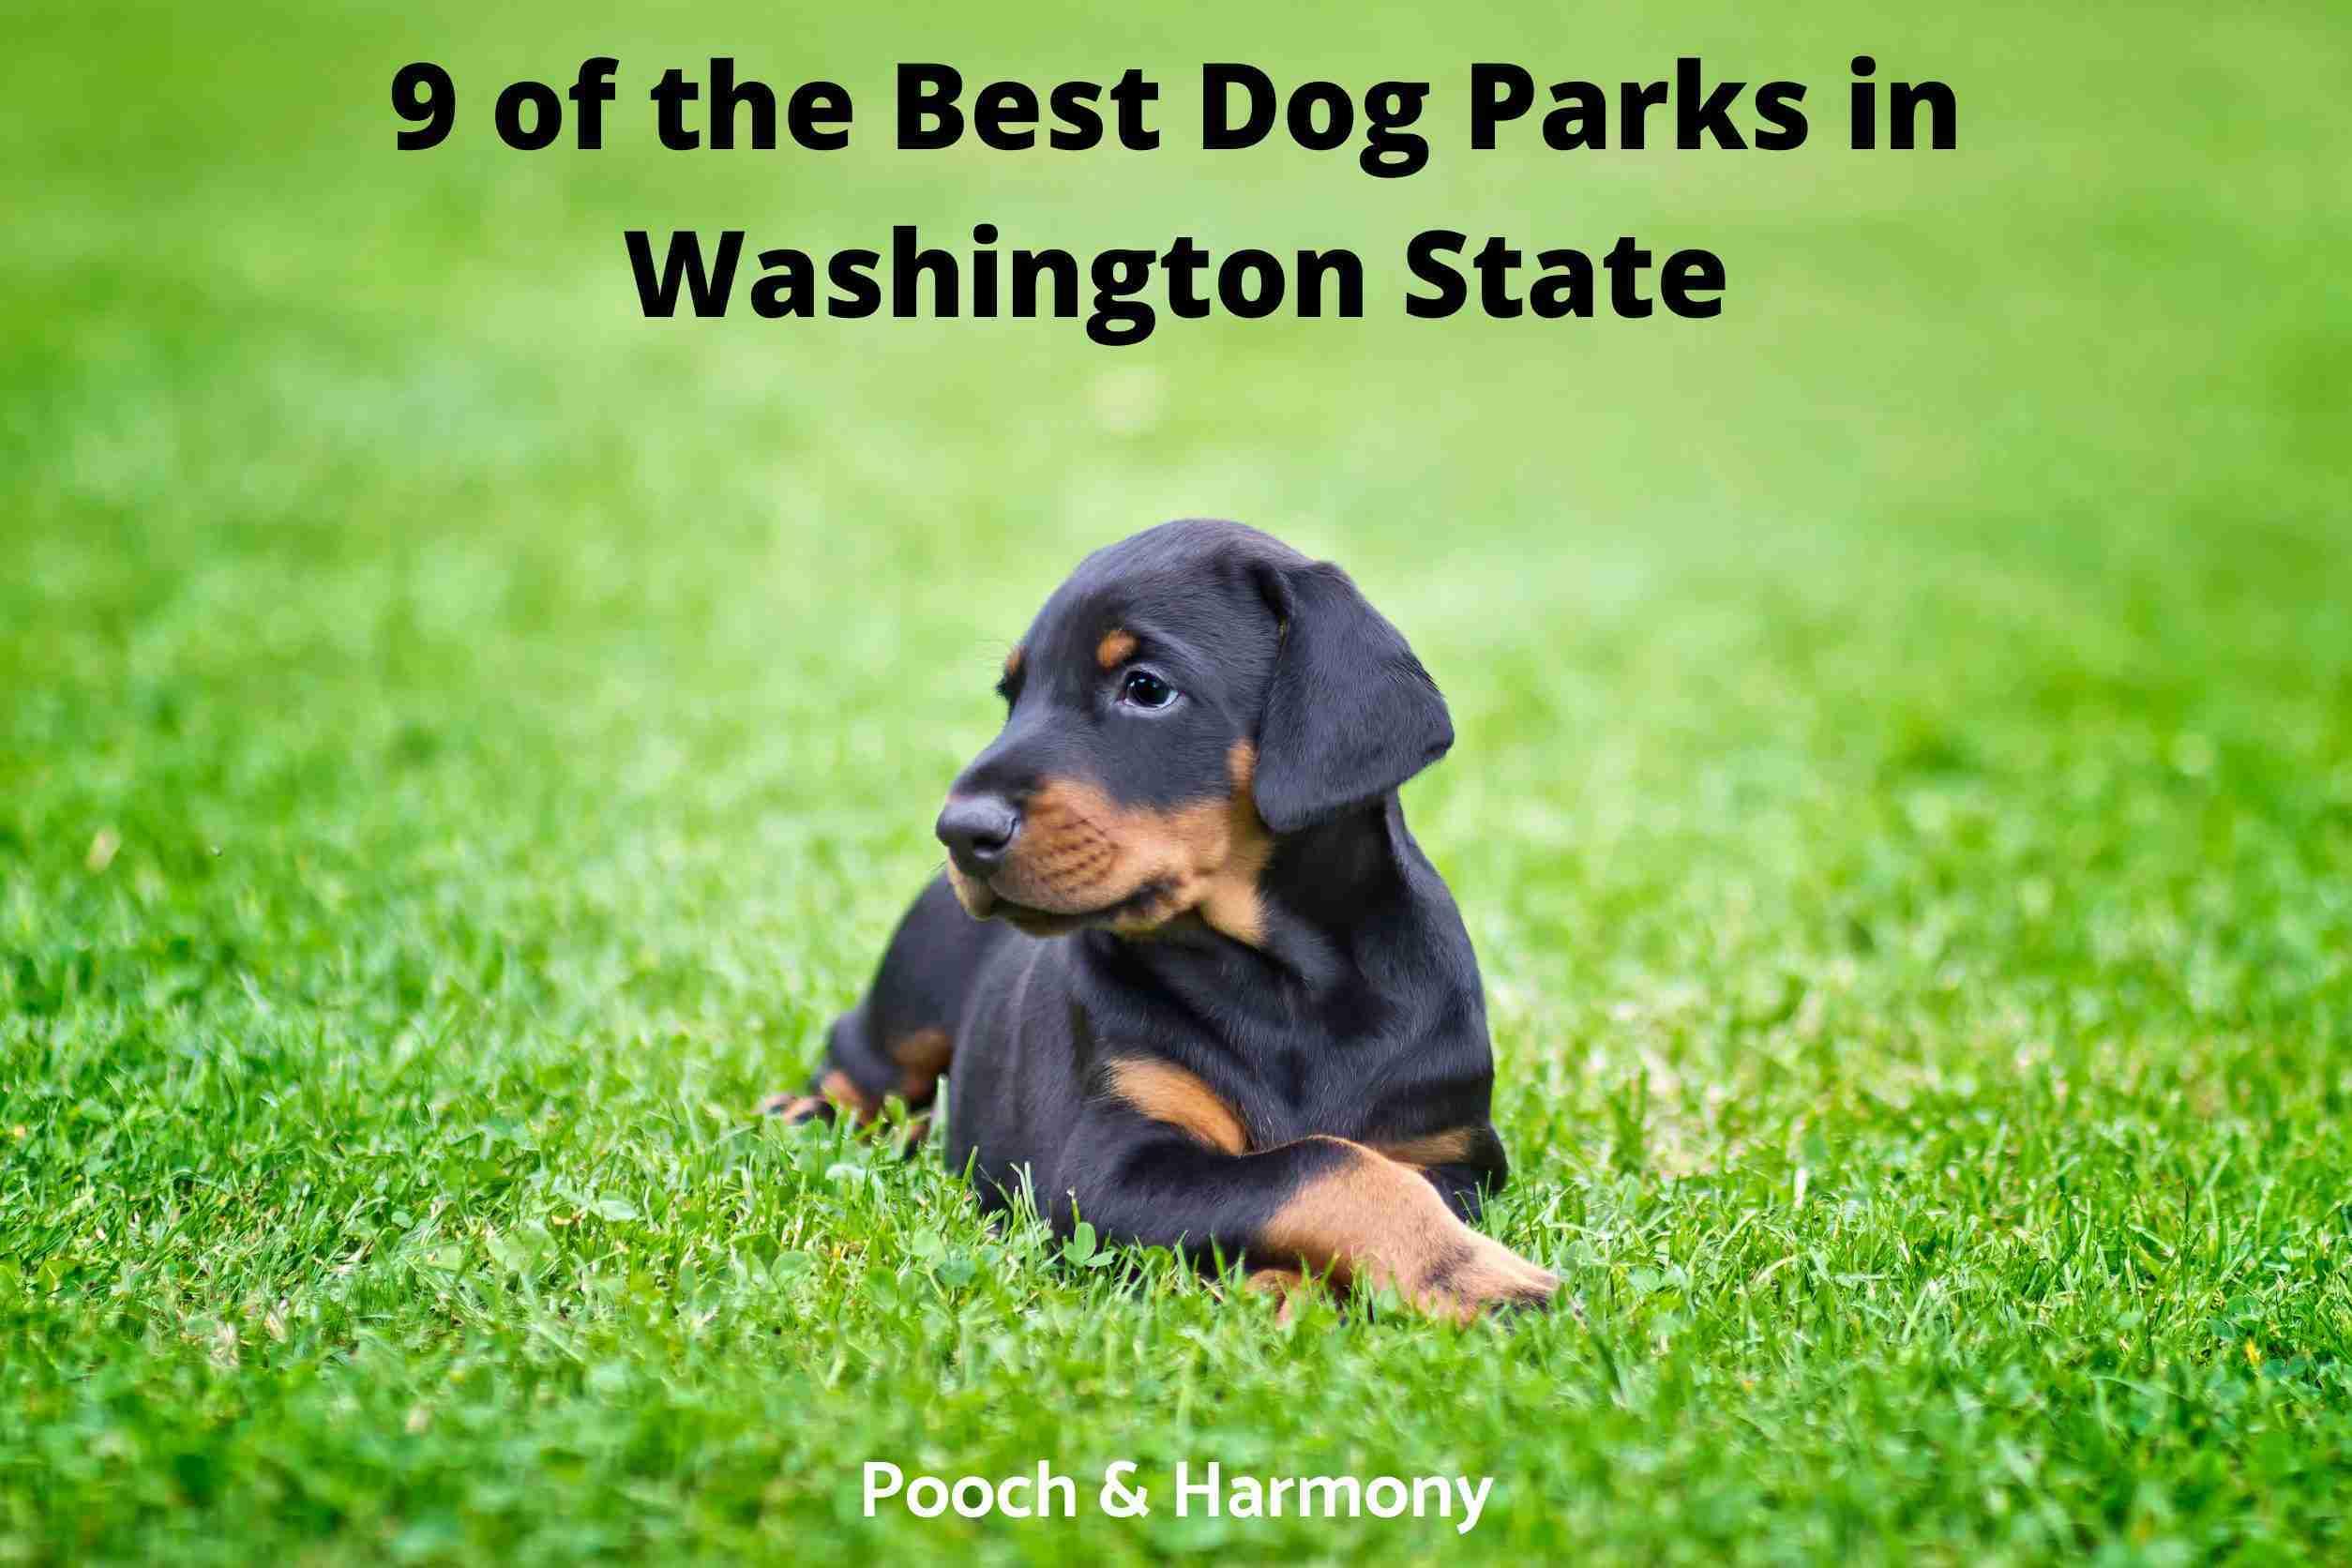 Best Dog Parks in Washington State